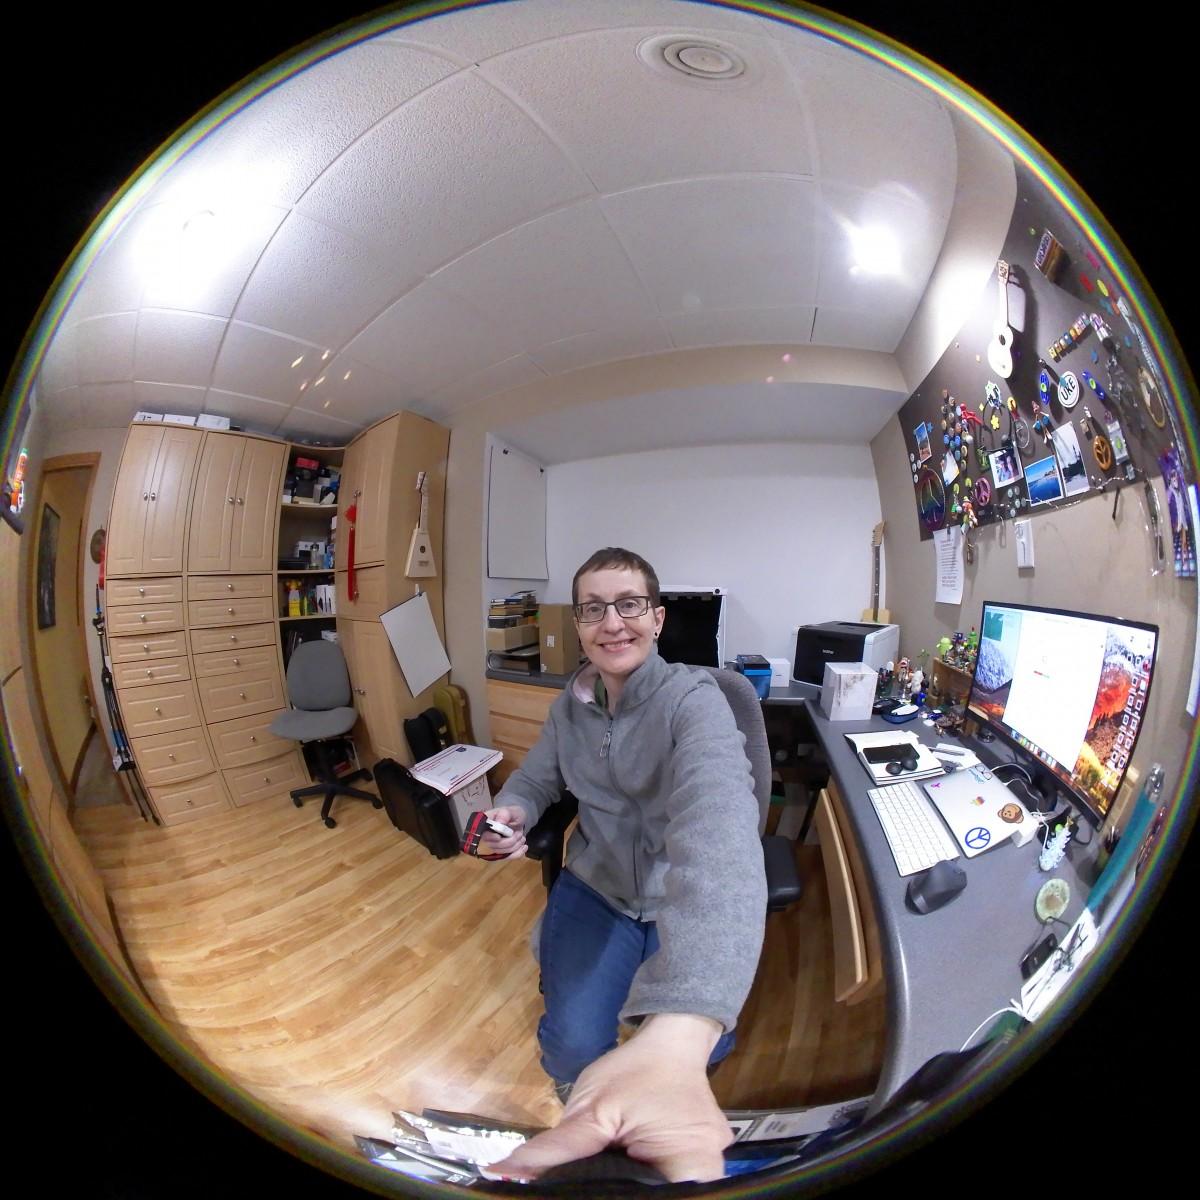 Kodak Pixpro Orbit360 4K VR Camera review – The Gadgeteer